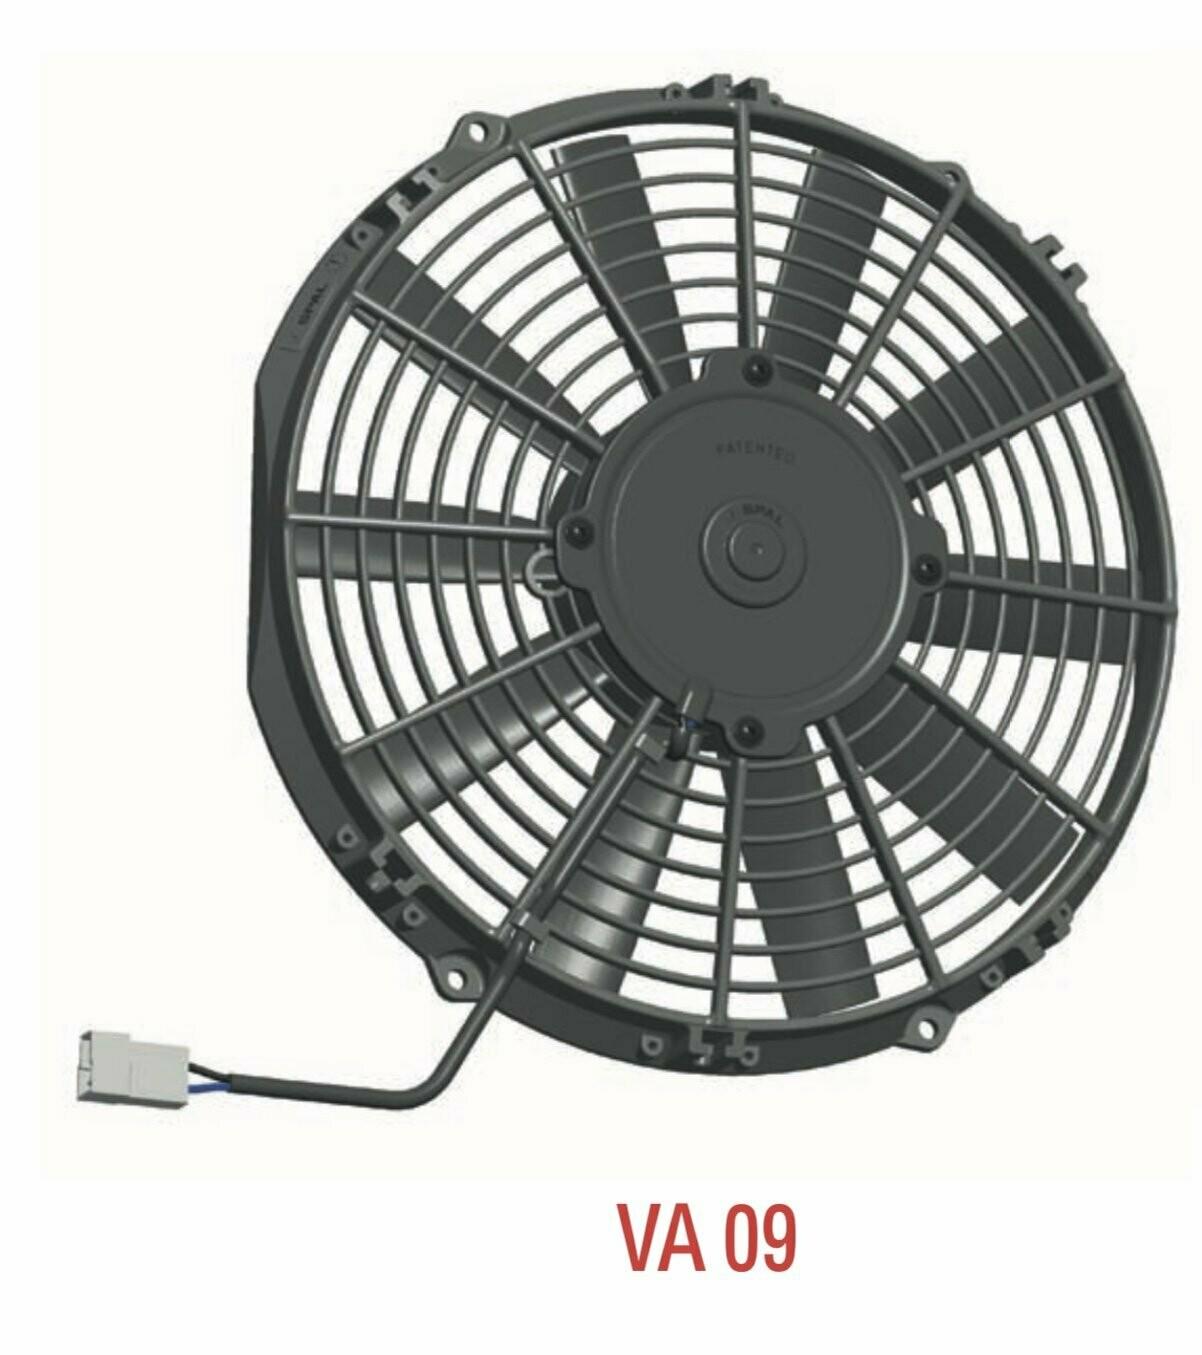 Spal 11 280mm Cooling Fan Va09 Ap12 Ll 27s 12v 826